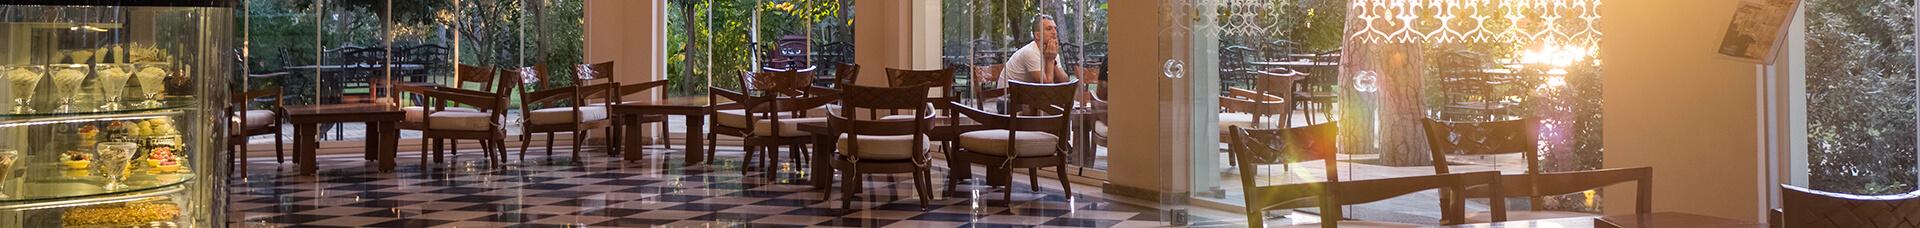 Ali Bey Resort Sorgun - Nazende Patisserie & Café